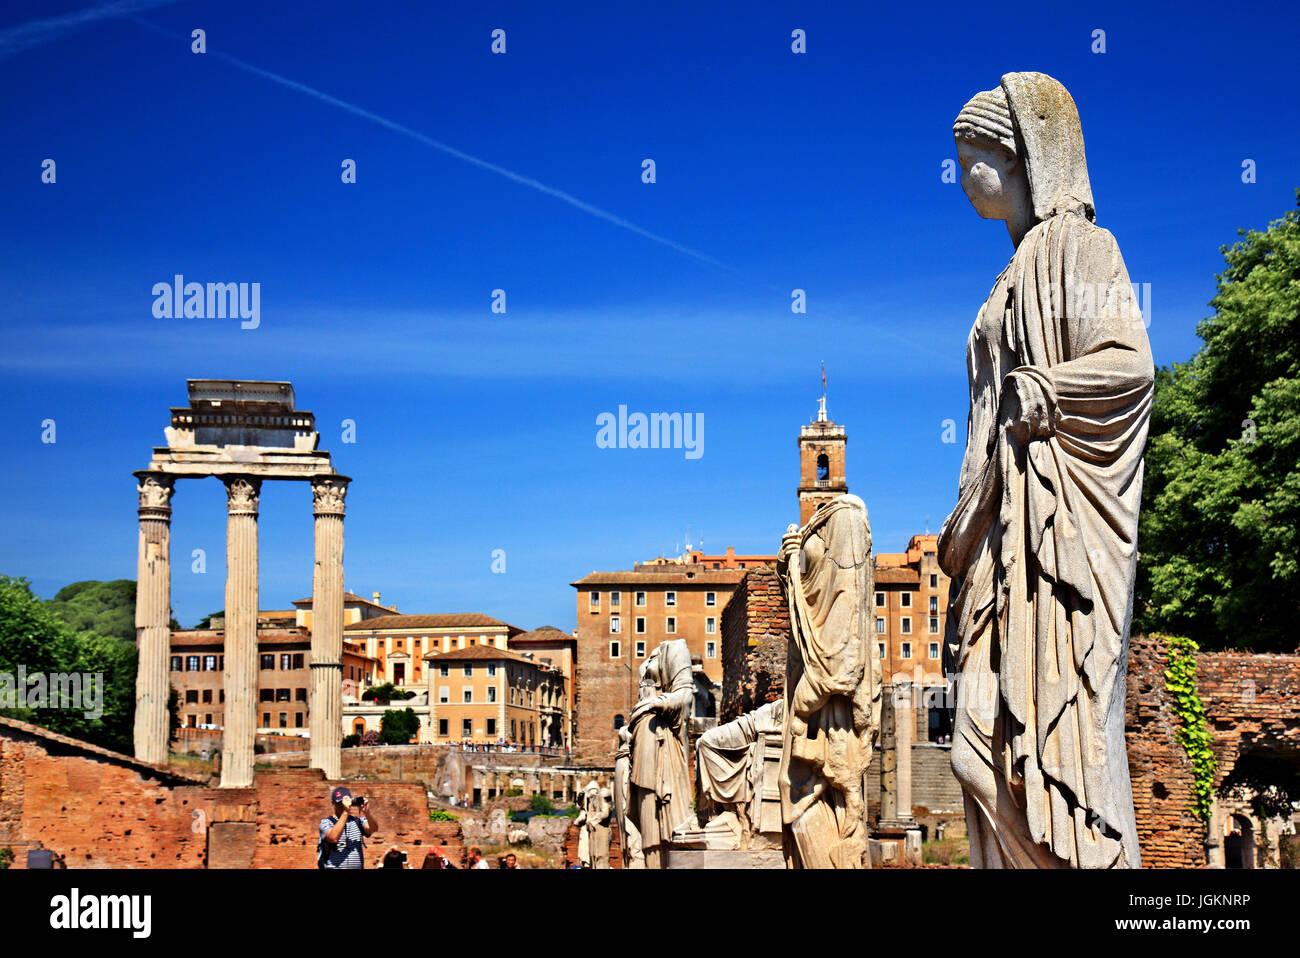 The Casa delle Vestali (House of the Vestal Virgins), Roman Forum, Rome, Italy. - Stock Image